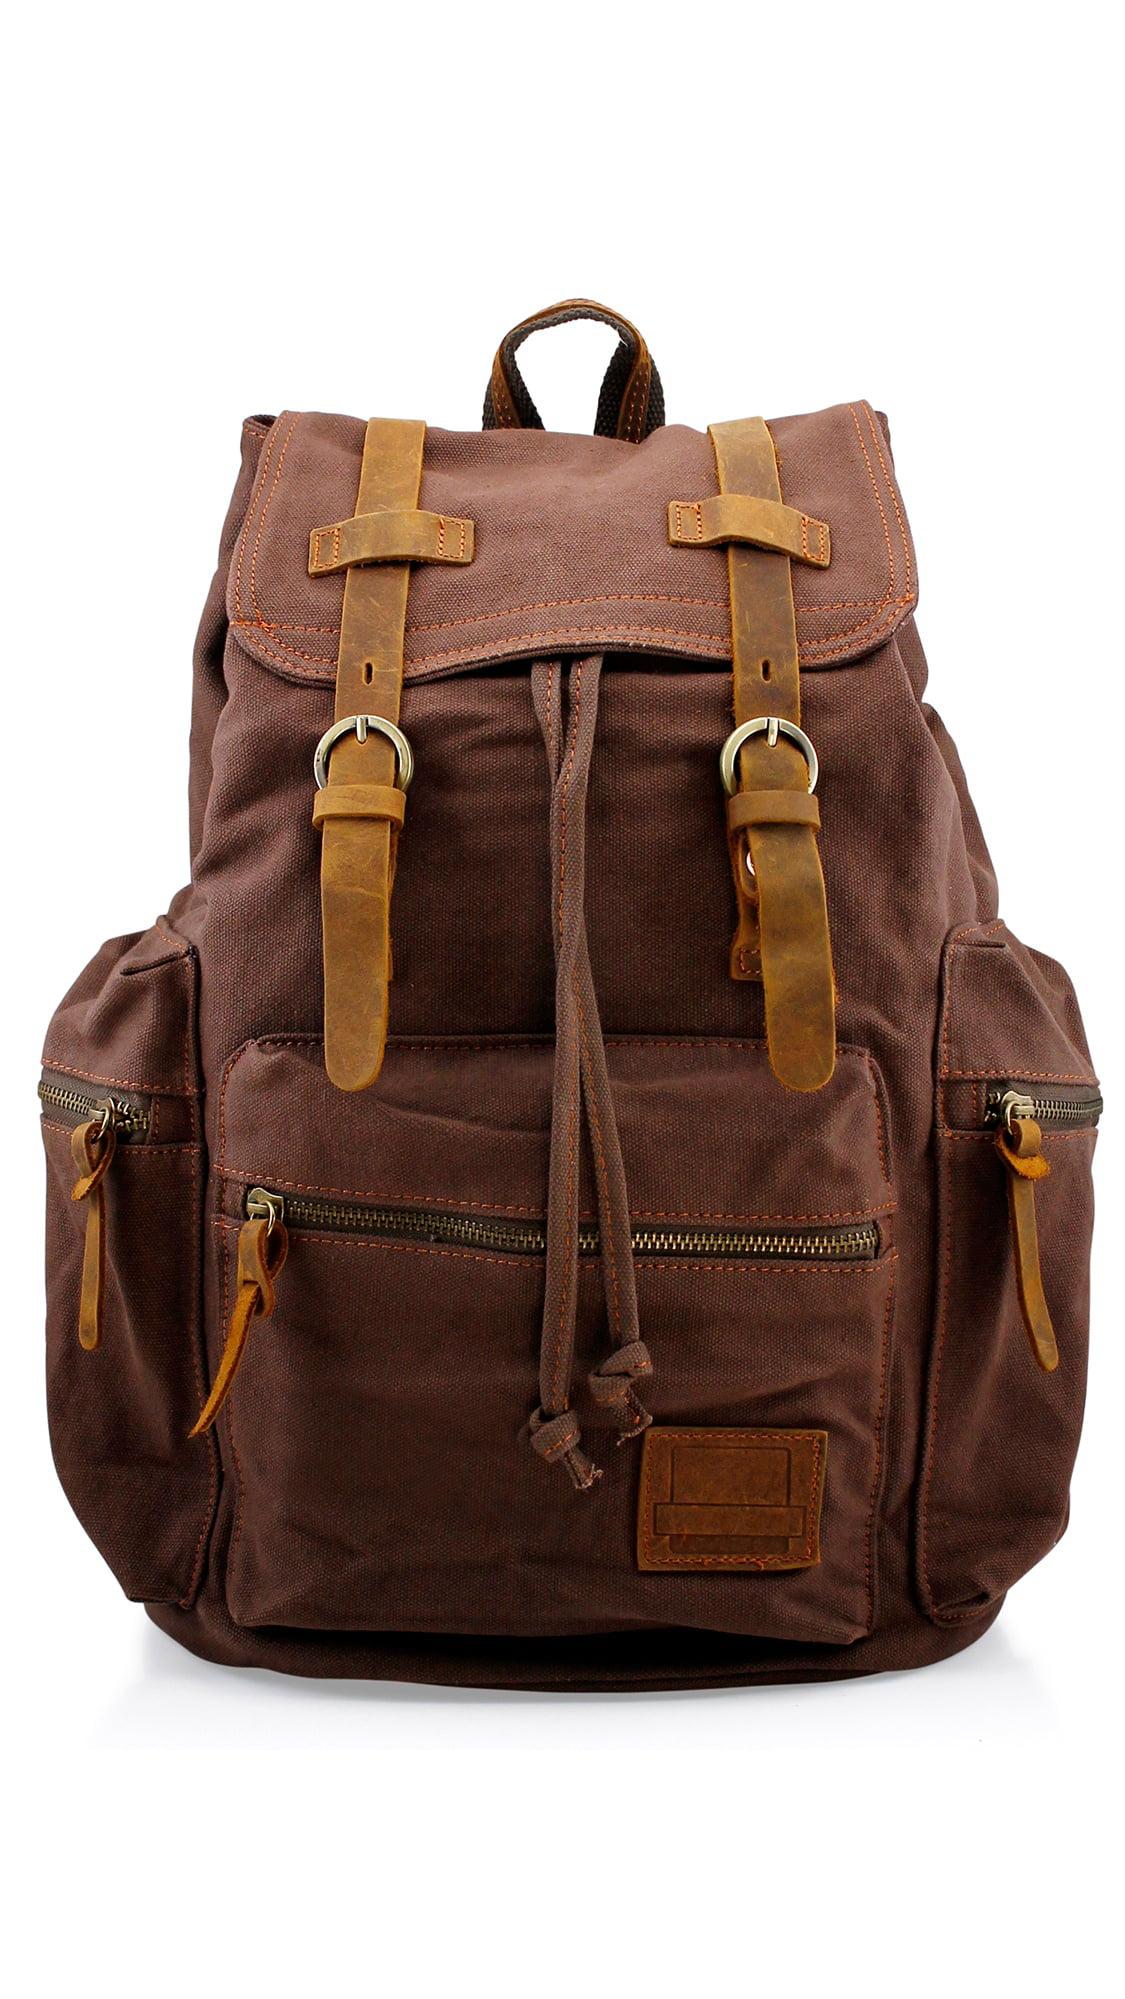 DURABLE MENS LARGE MILITARY CANVAS BACKPACK TRAVEL CAMPING SCHOOL SHOULDER BAG